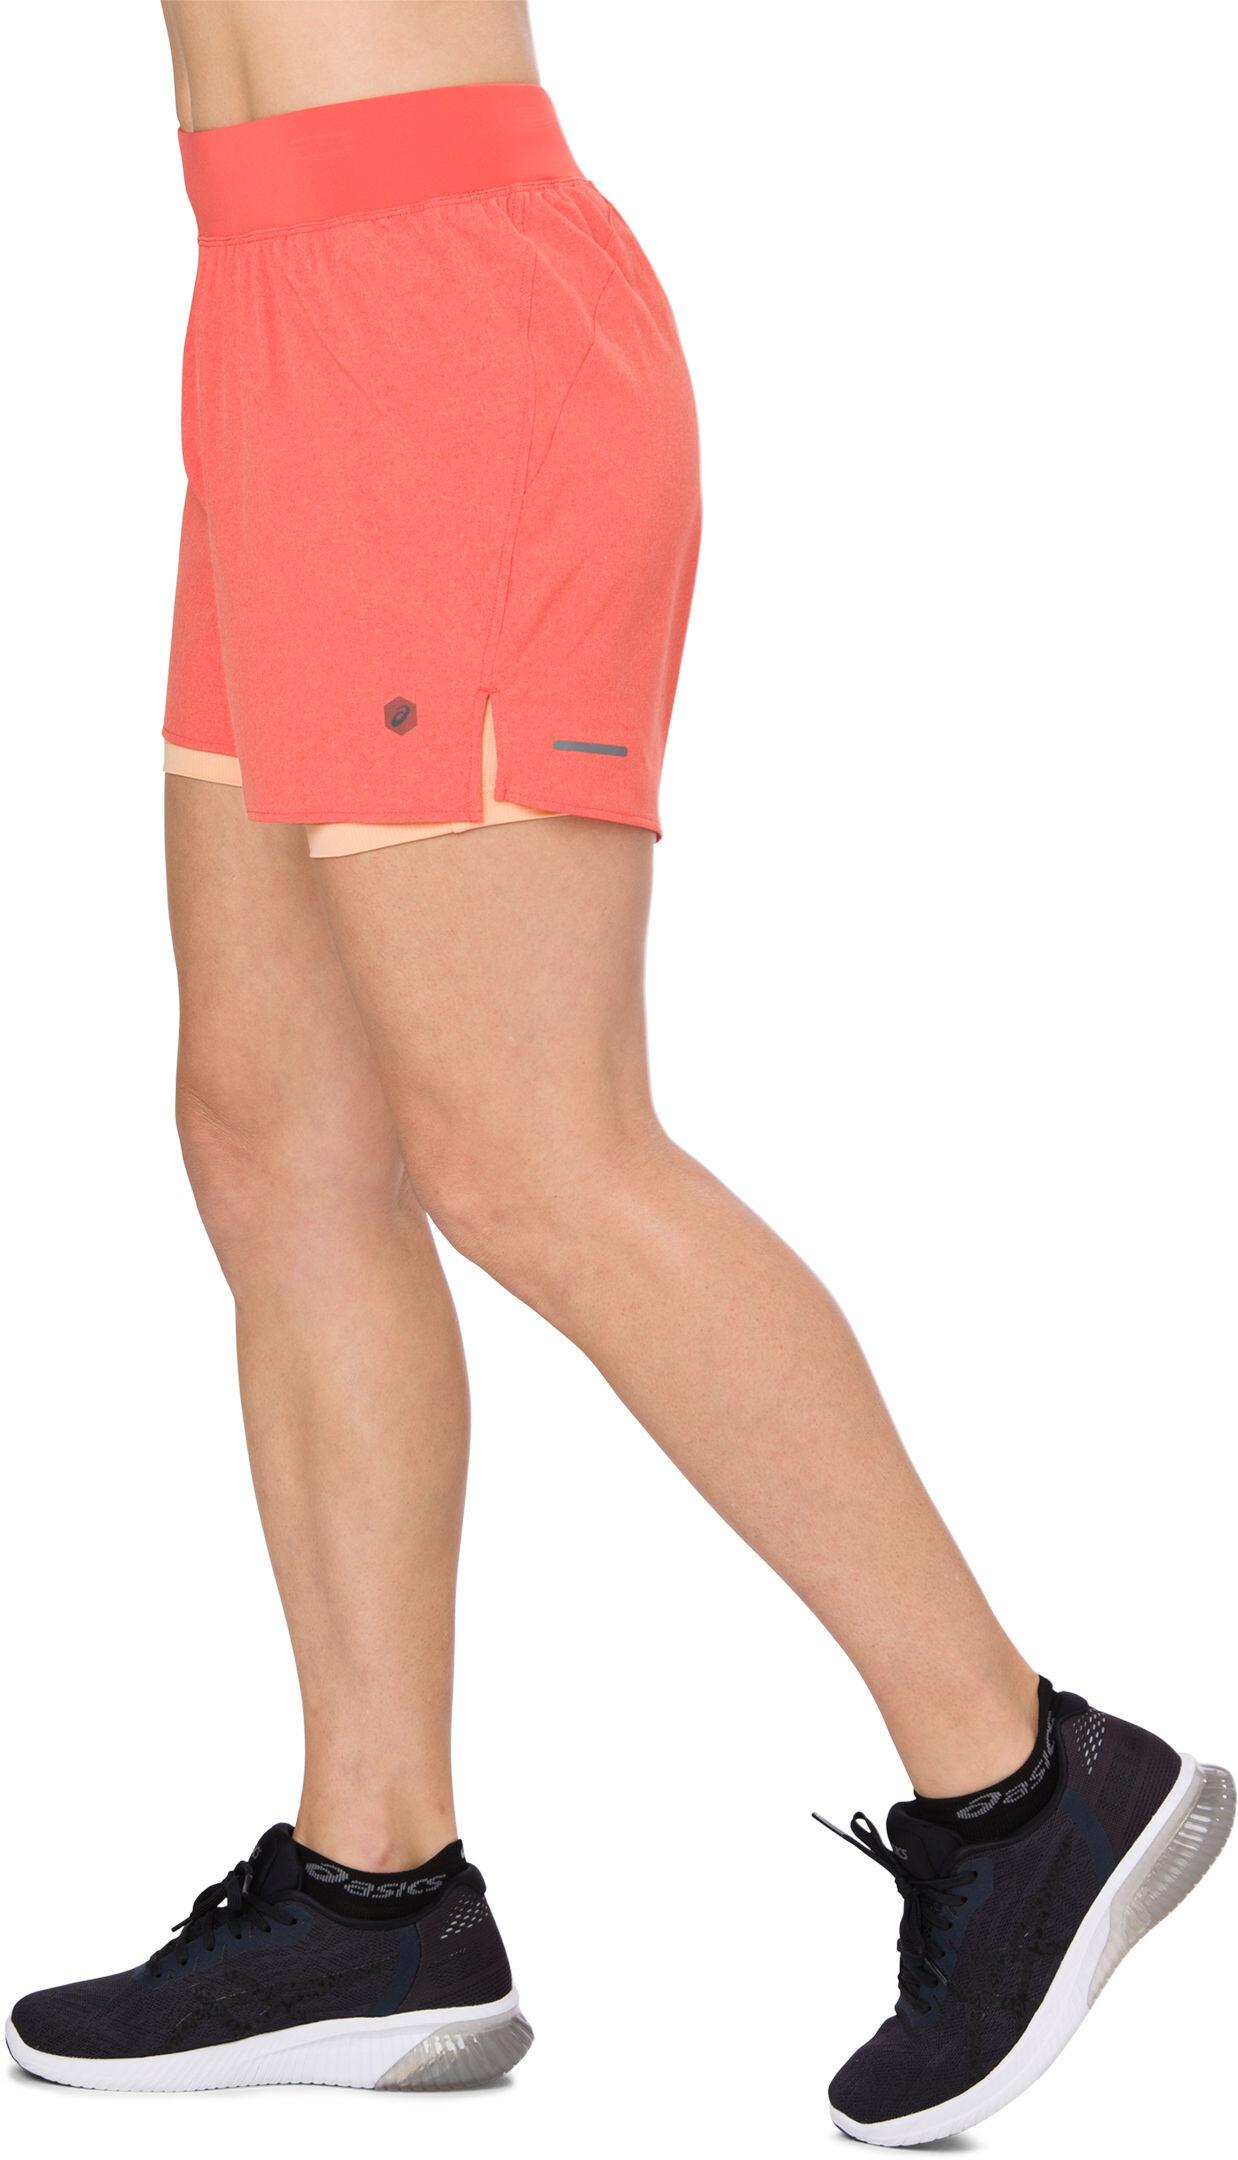 48a90805518 asics 2-N-1 5.5In Hardloop Shorts Dames oranje I Online op bikester.be